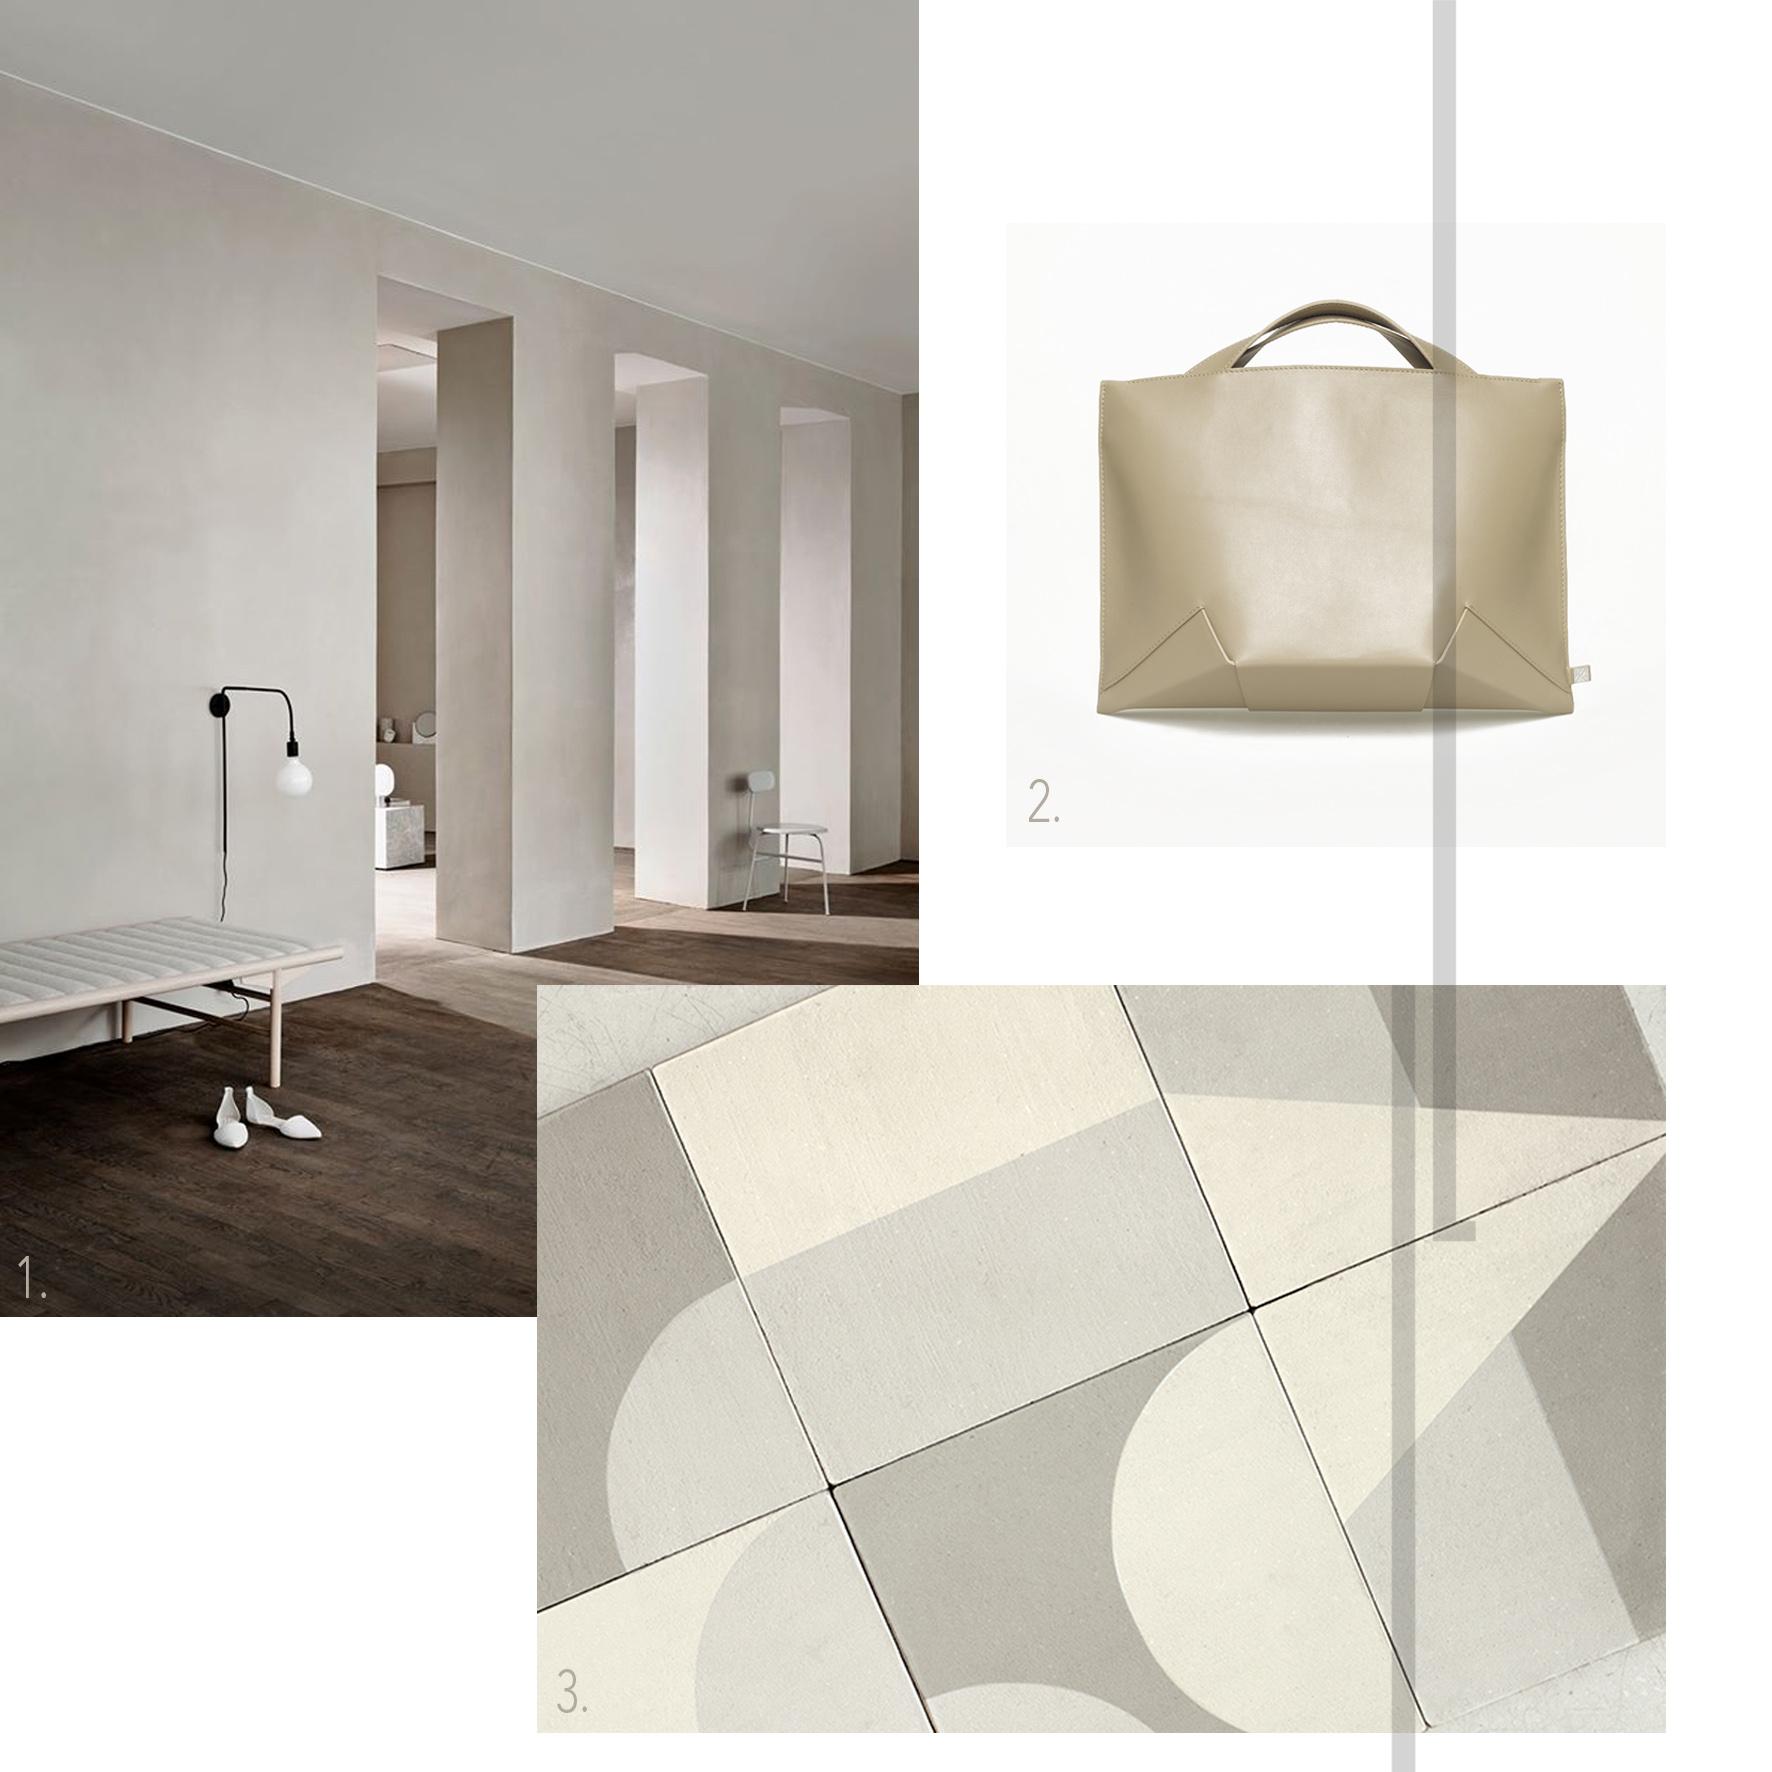 interiorlines_002.jpg